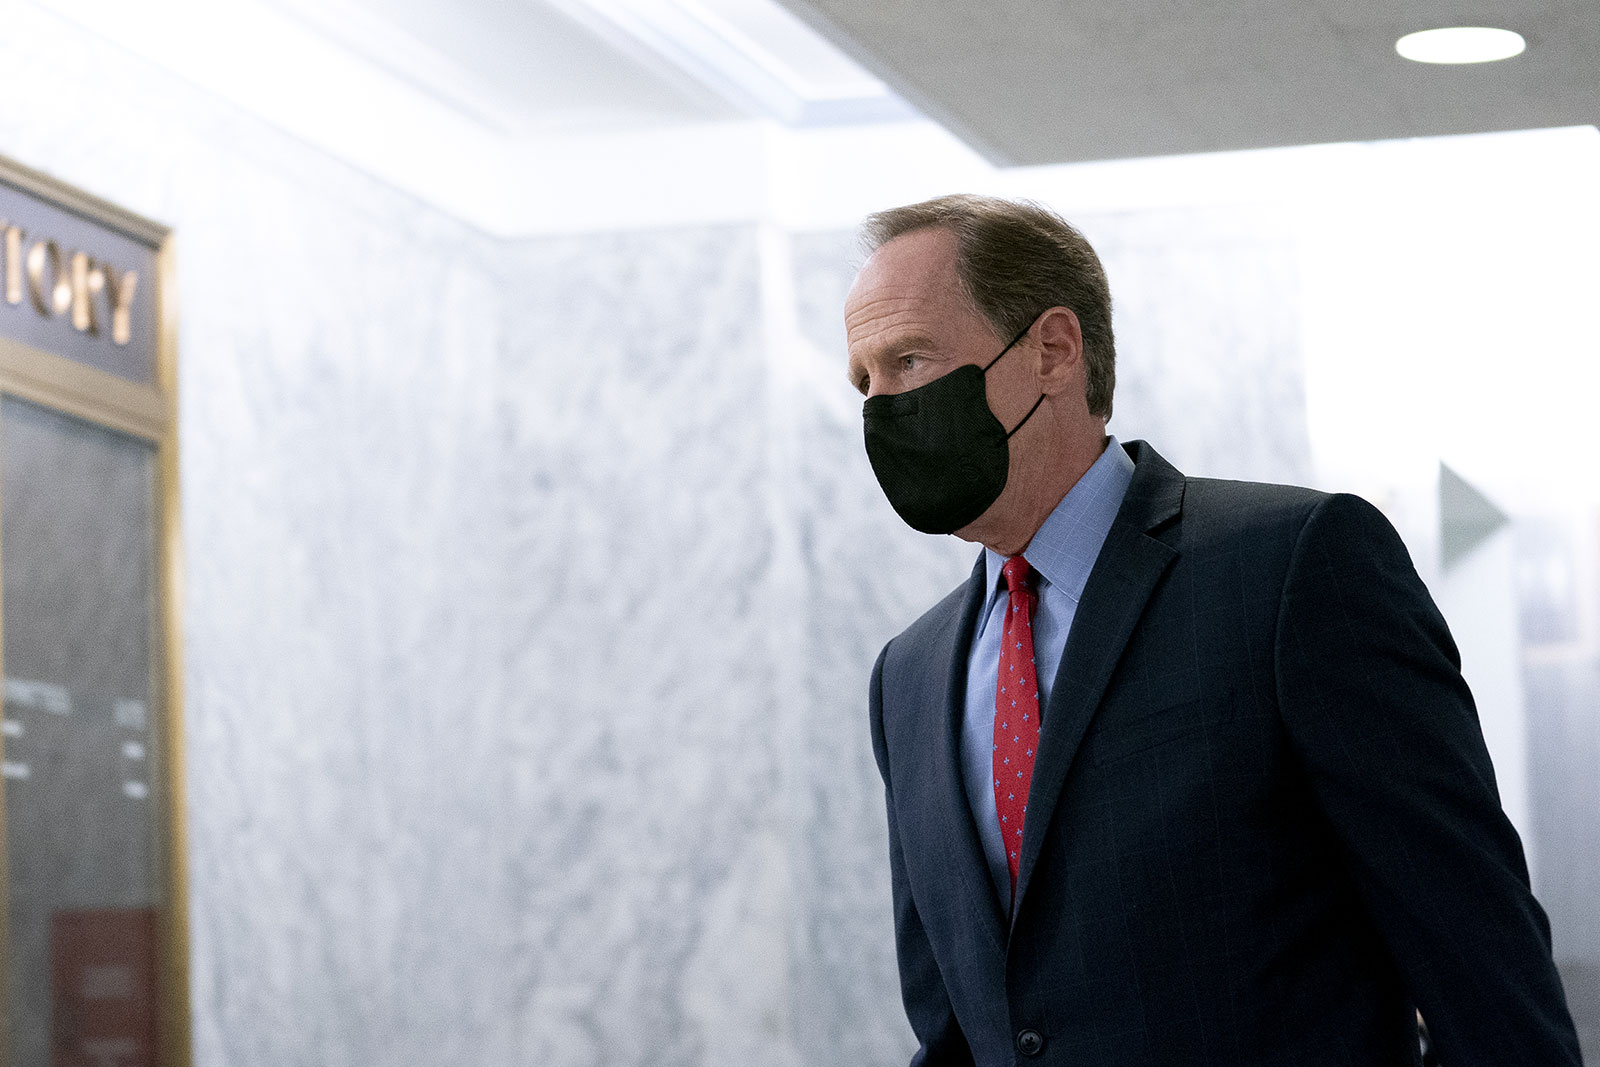 Sen. Pat Toomey walks through the Hart Senate Office Building in Washington, DC, on November 12.